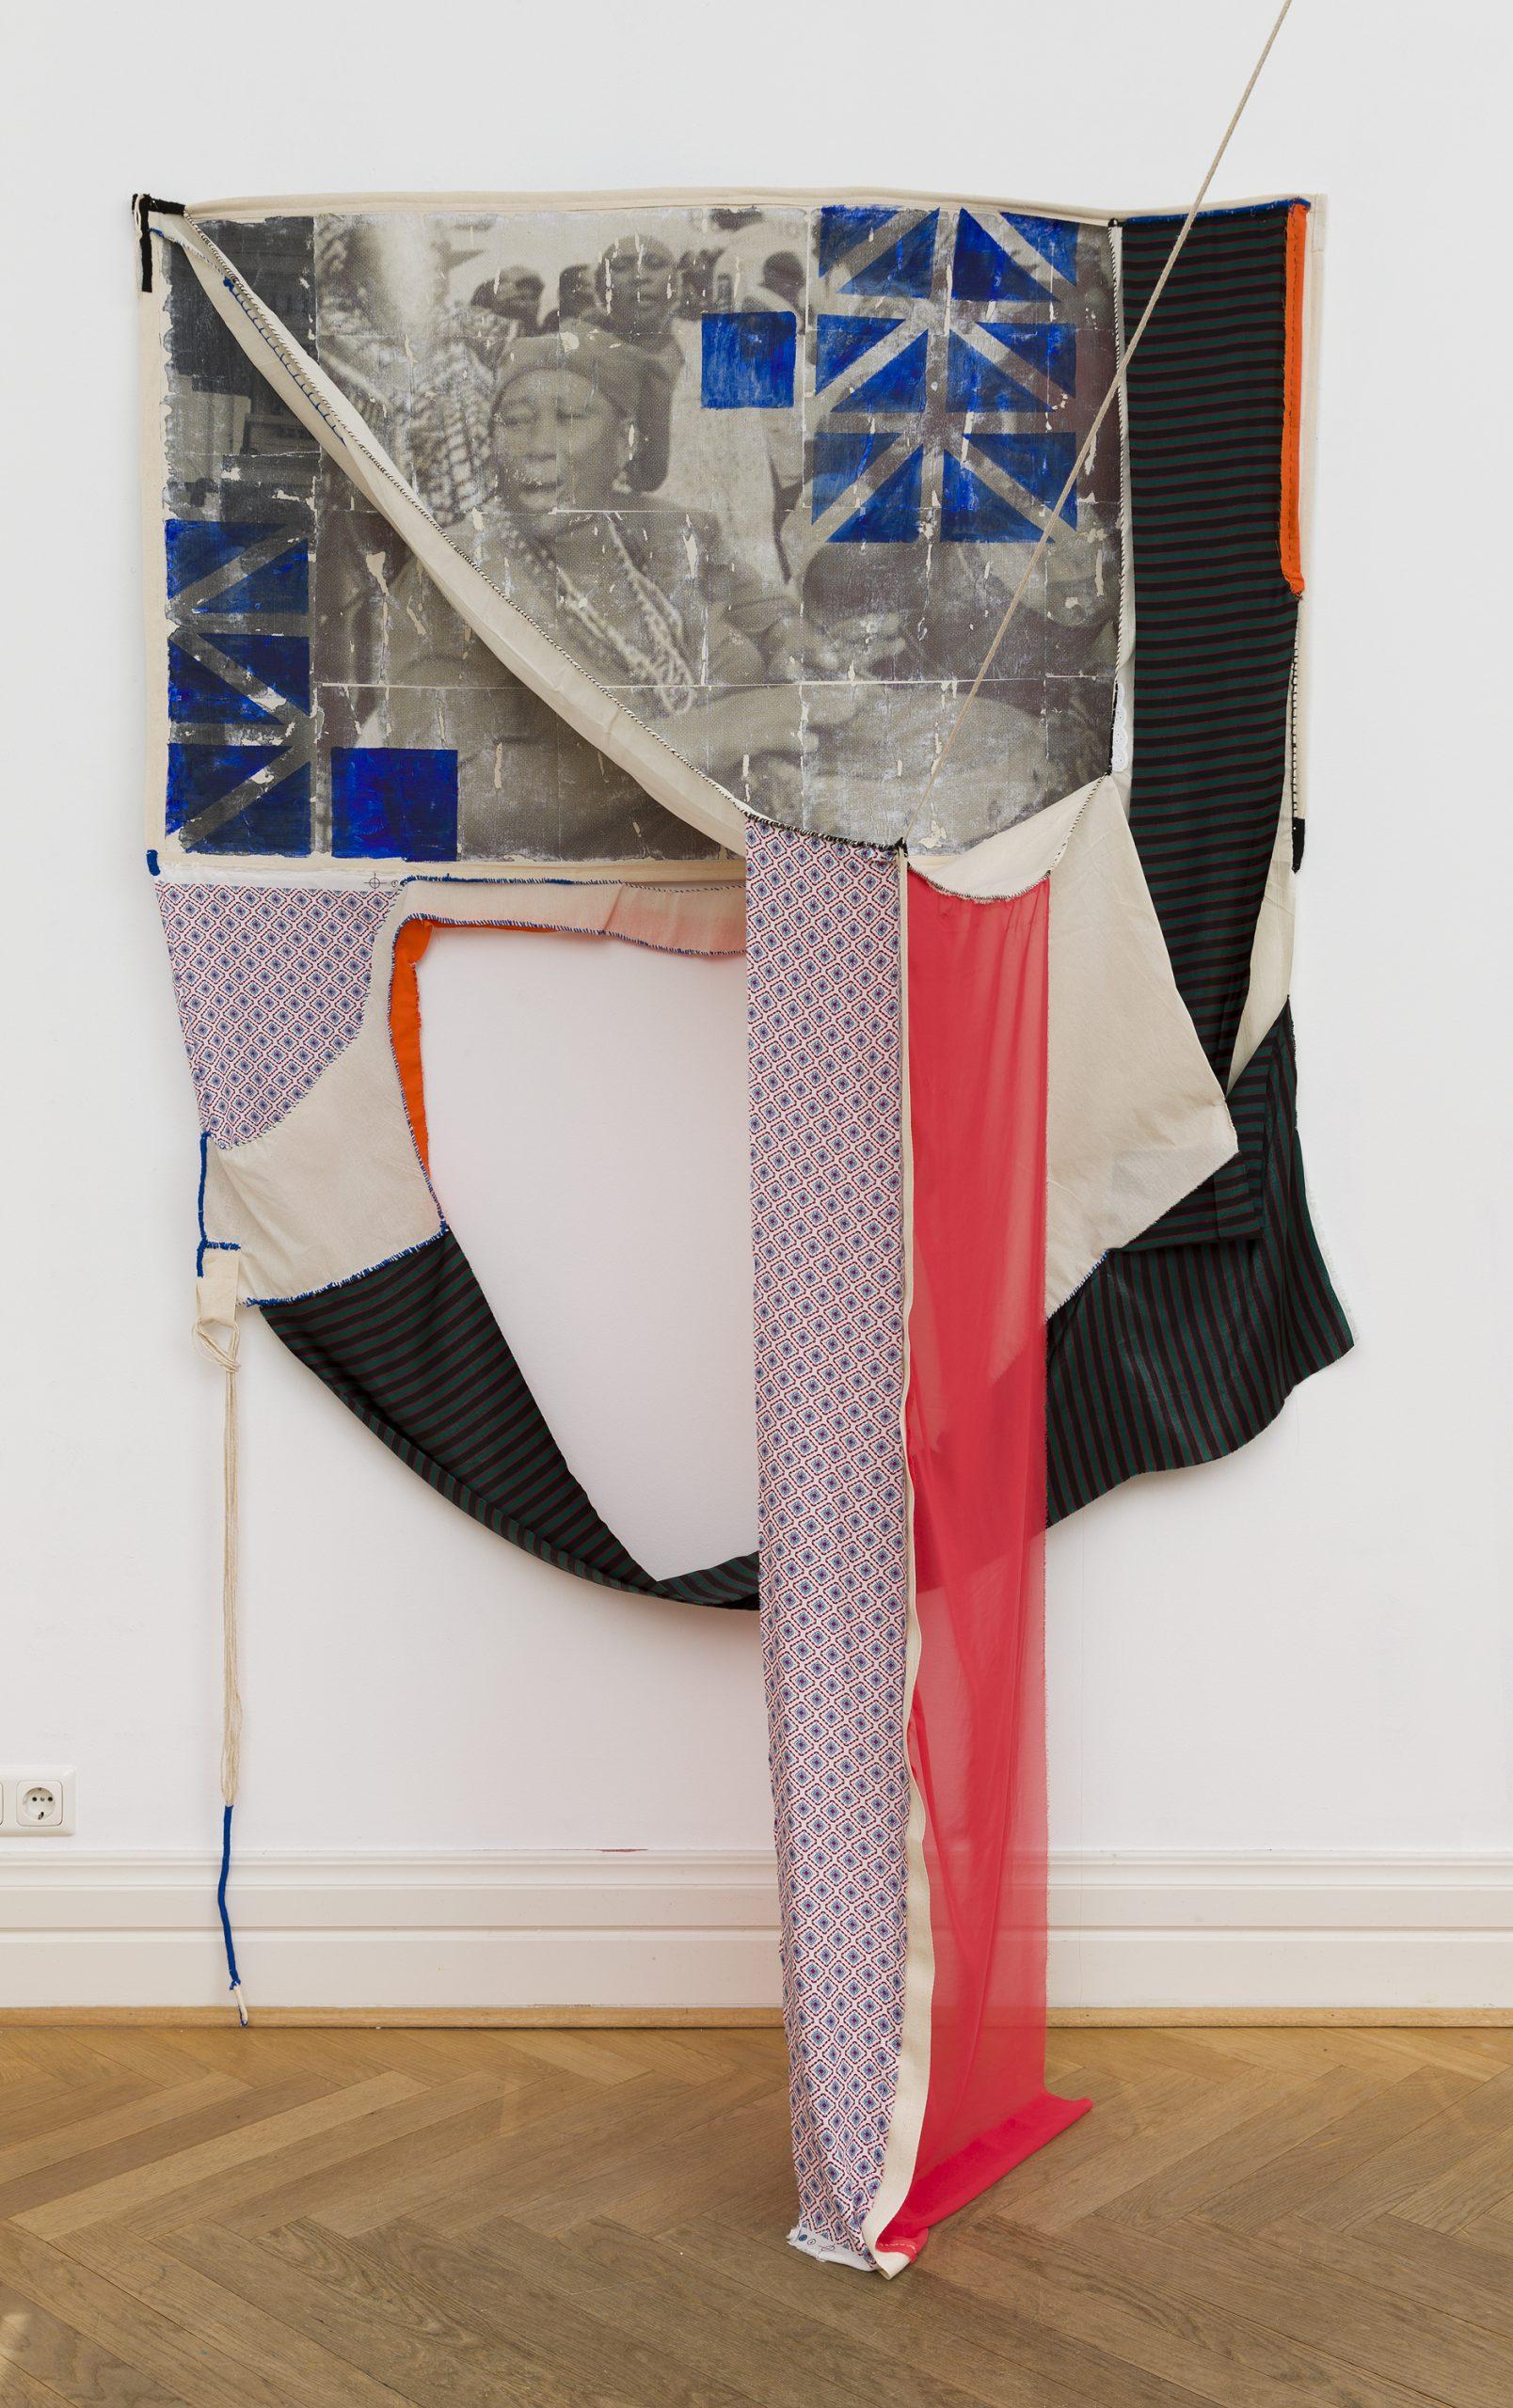 Januário Jano, 'Axiliuanda I', 2021. Photo by Ivan Murzin, Courtesy of Jean-Claude Maier Gallery